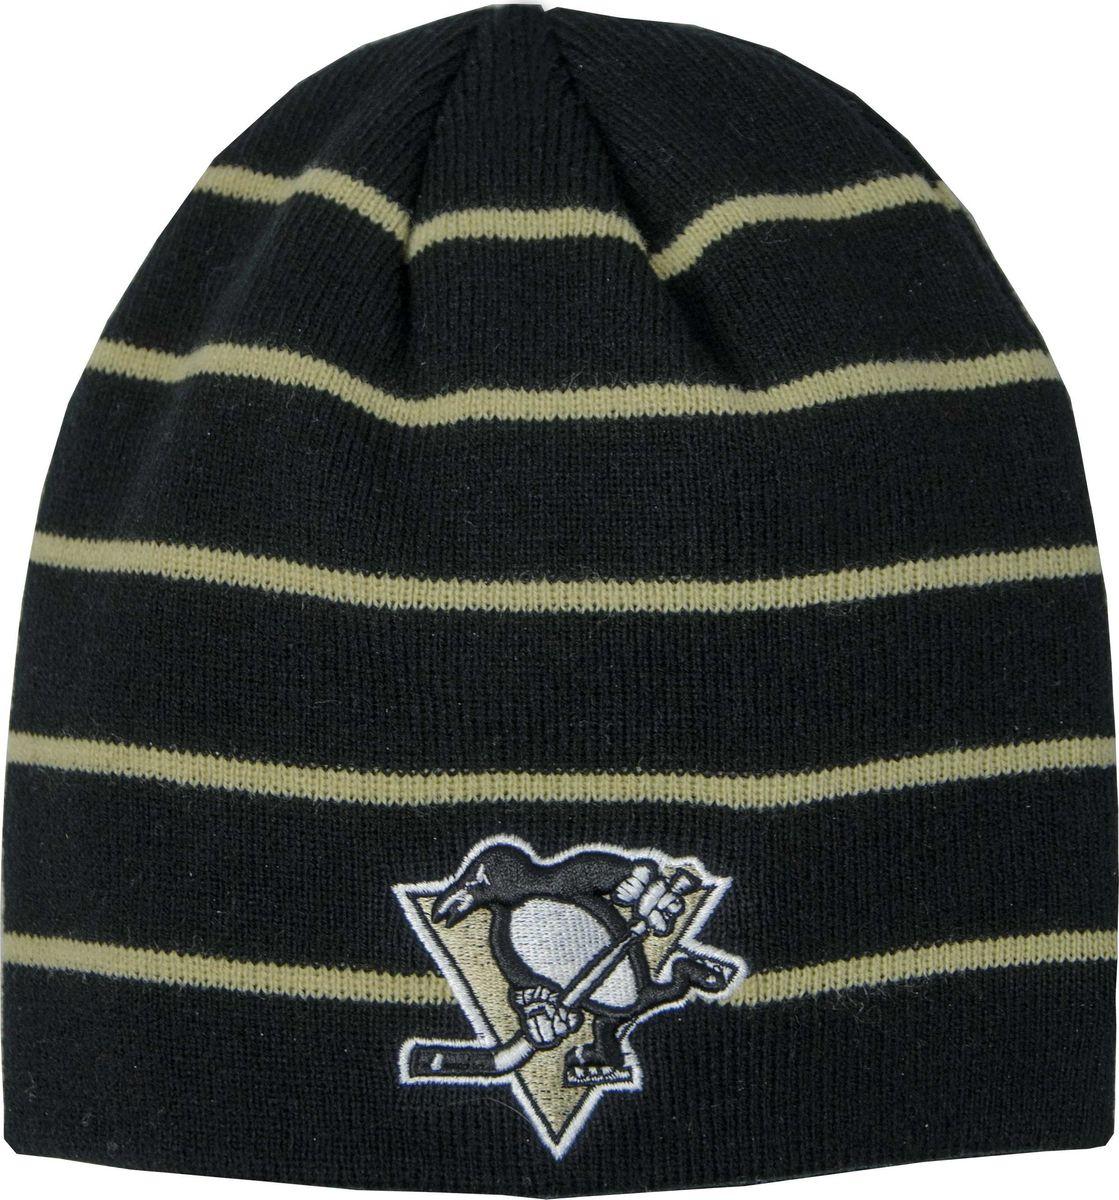 Шапка мужская Atributika & Club Pittsburgh Penguins, цвет: черный. 59038. Размер 55/5859038